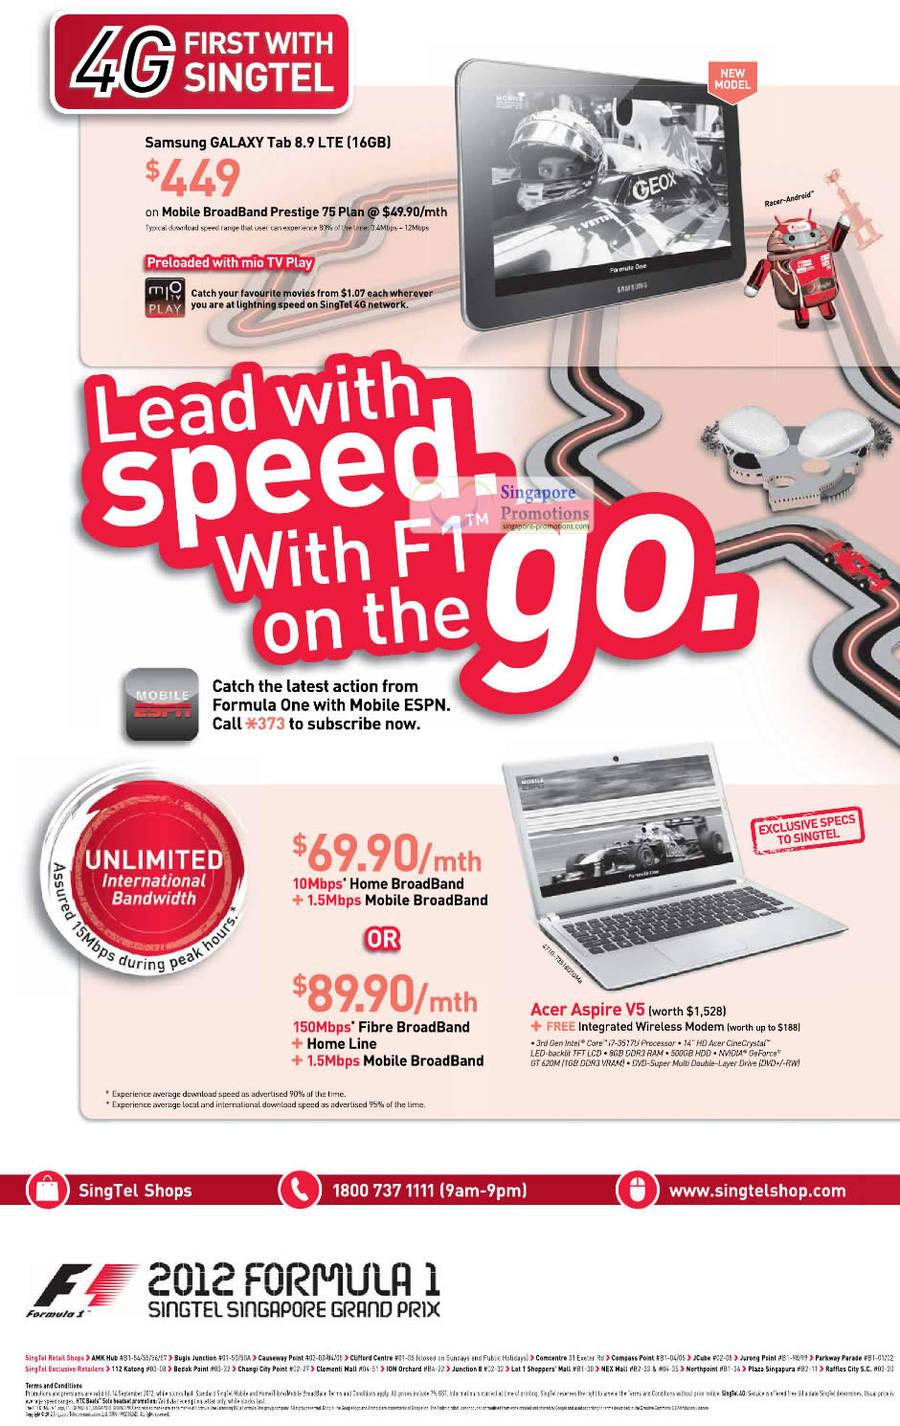 Samsung Galaxy Tab 8.9 LTE, ADSL Broadband Free Acer Aspire V5 Notebook